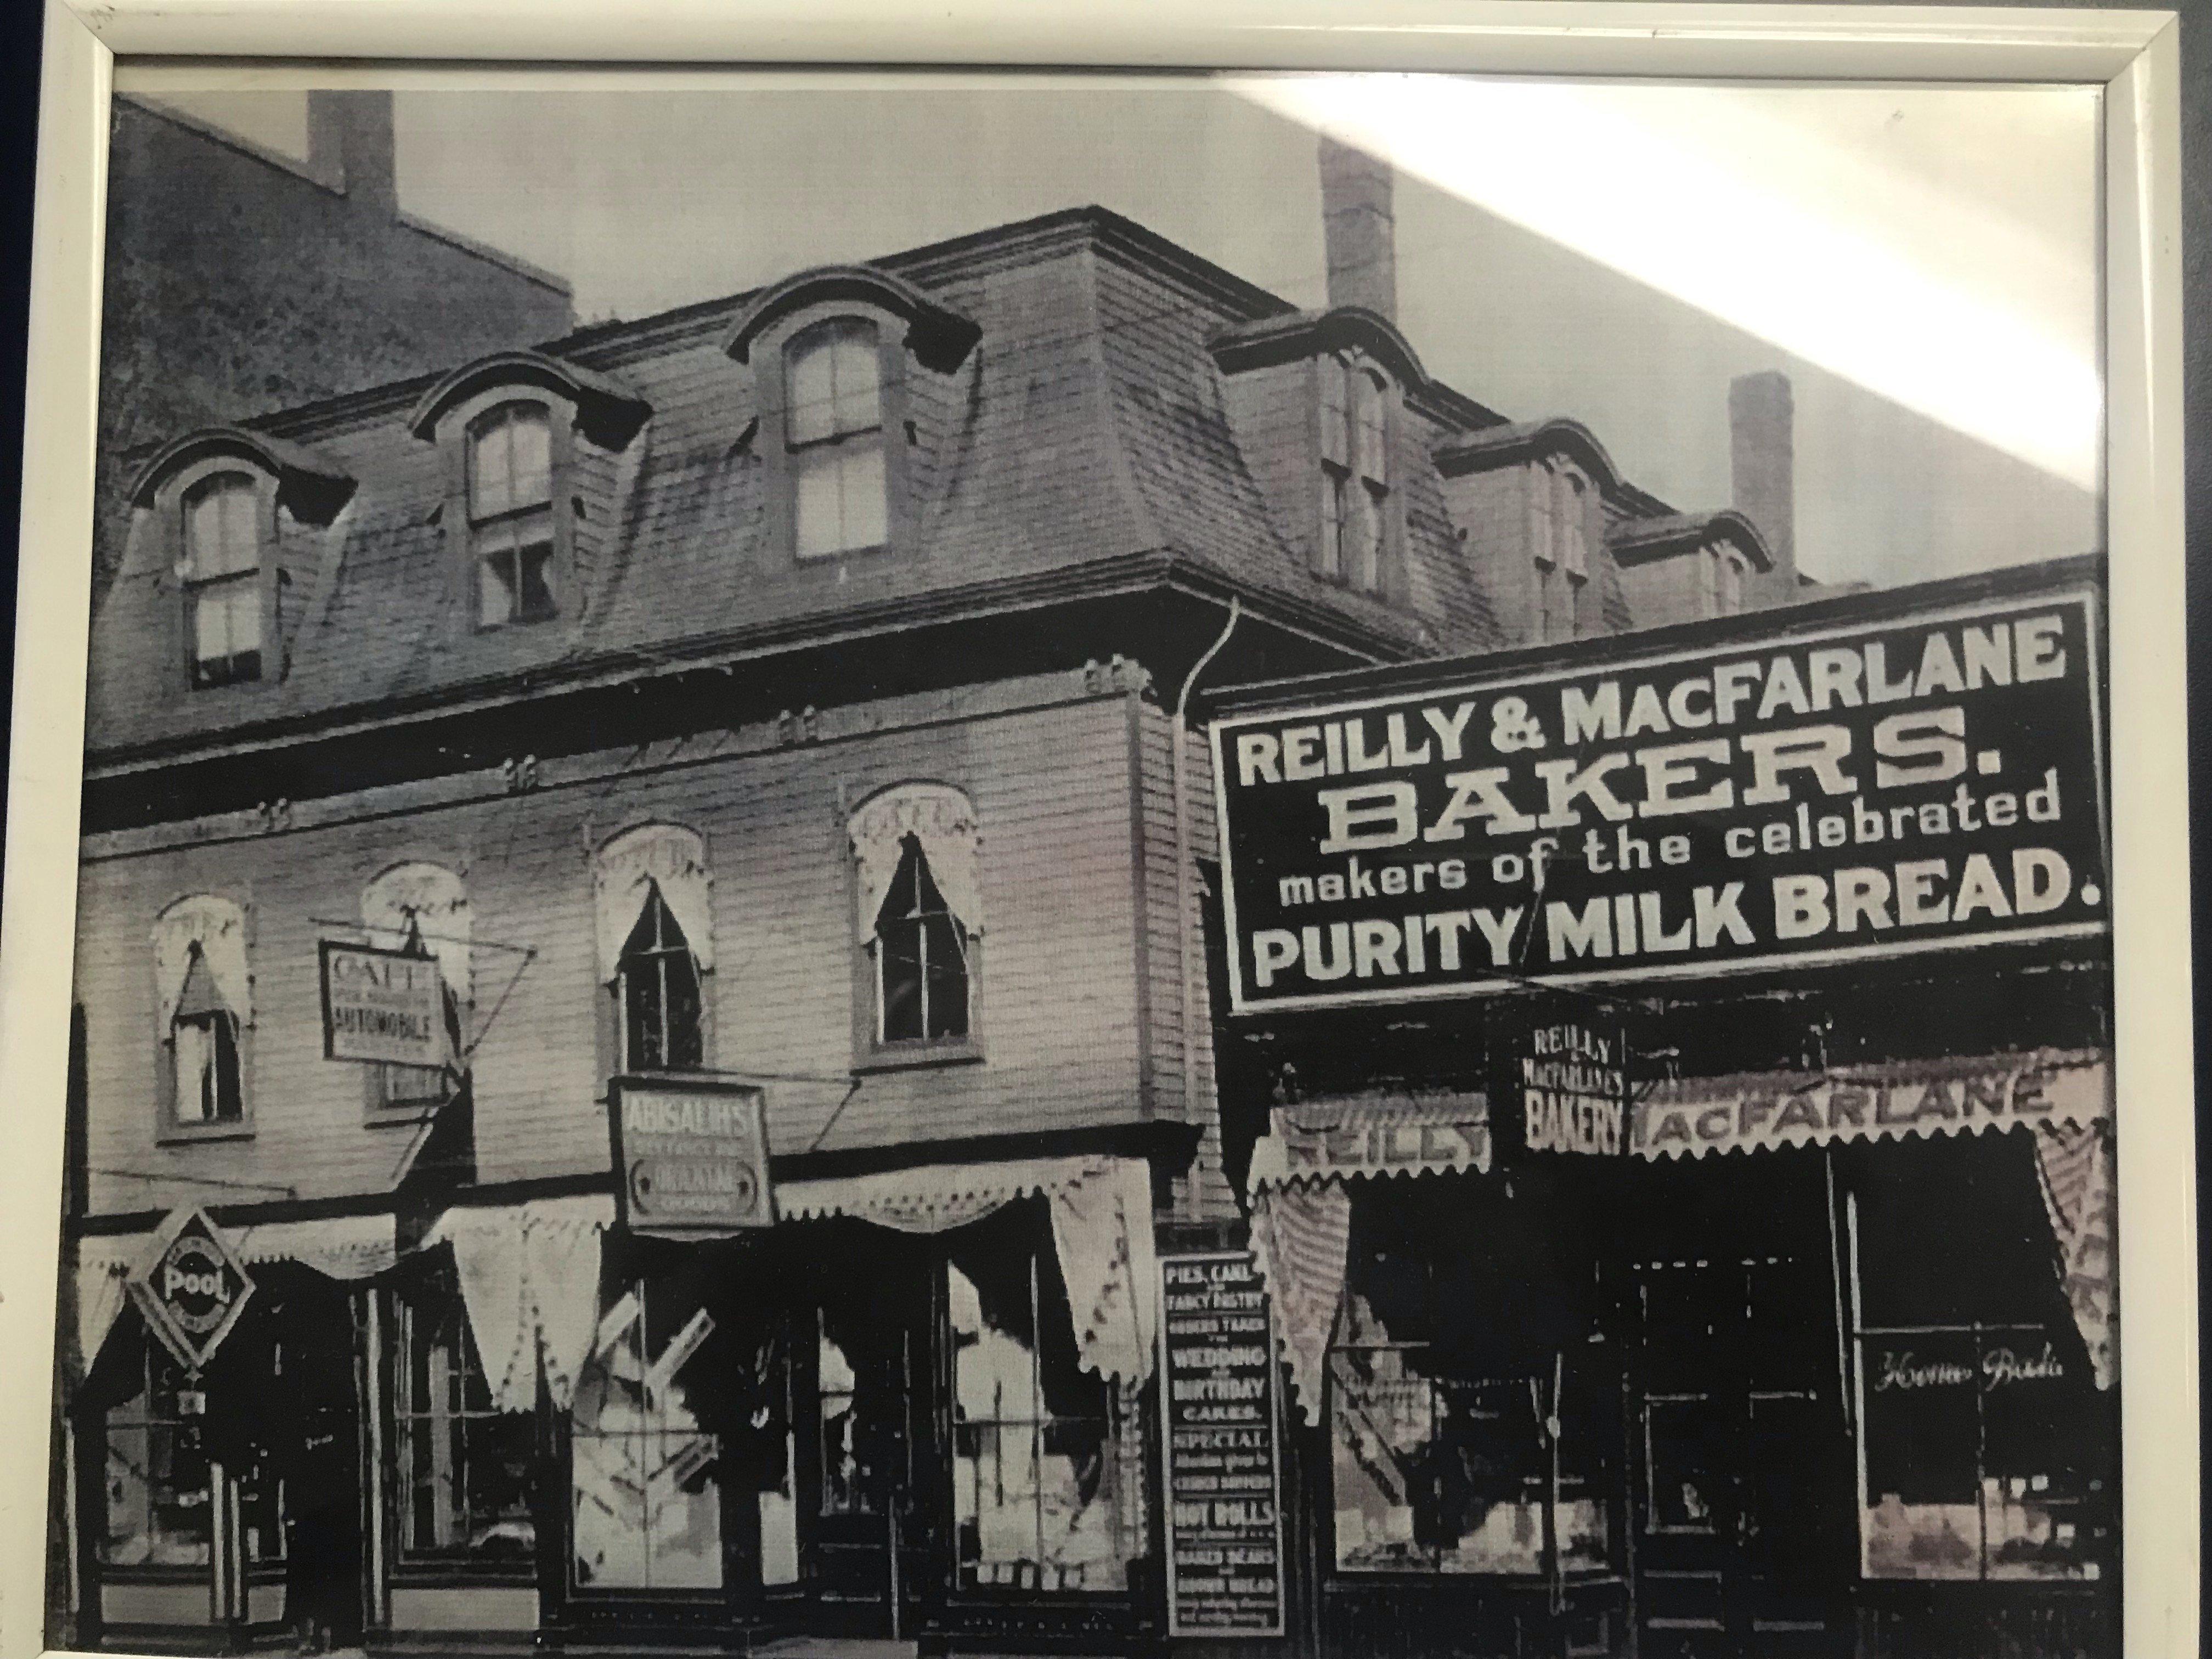 Reilly & MacFarlane Bakers